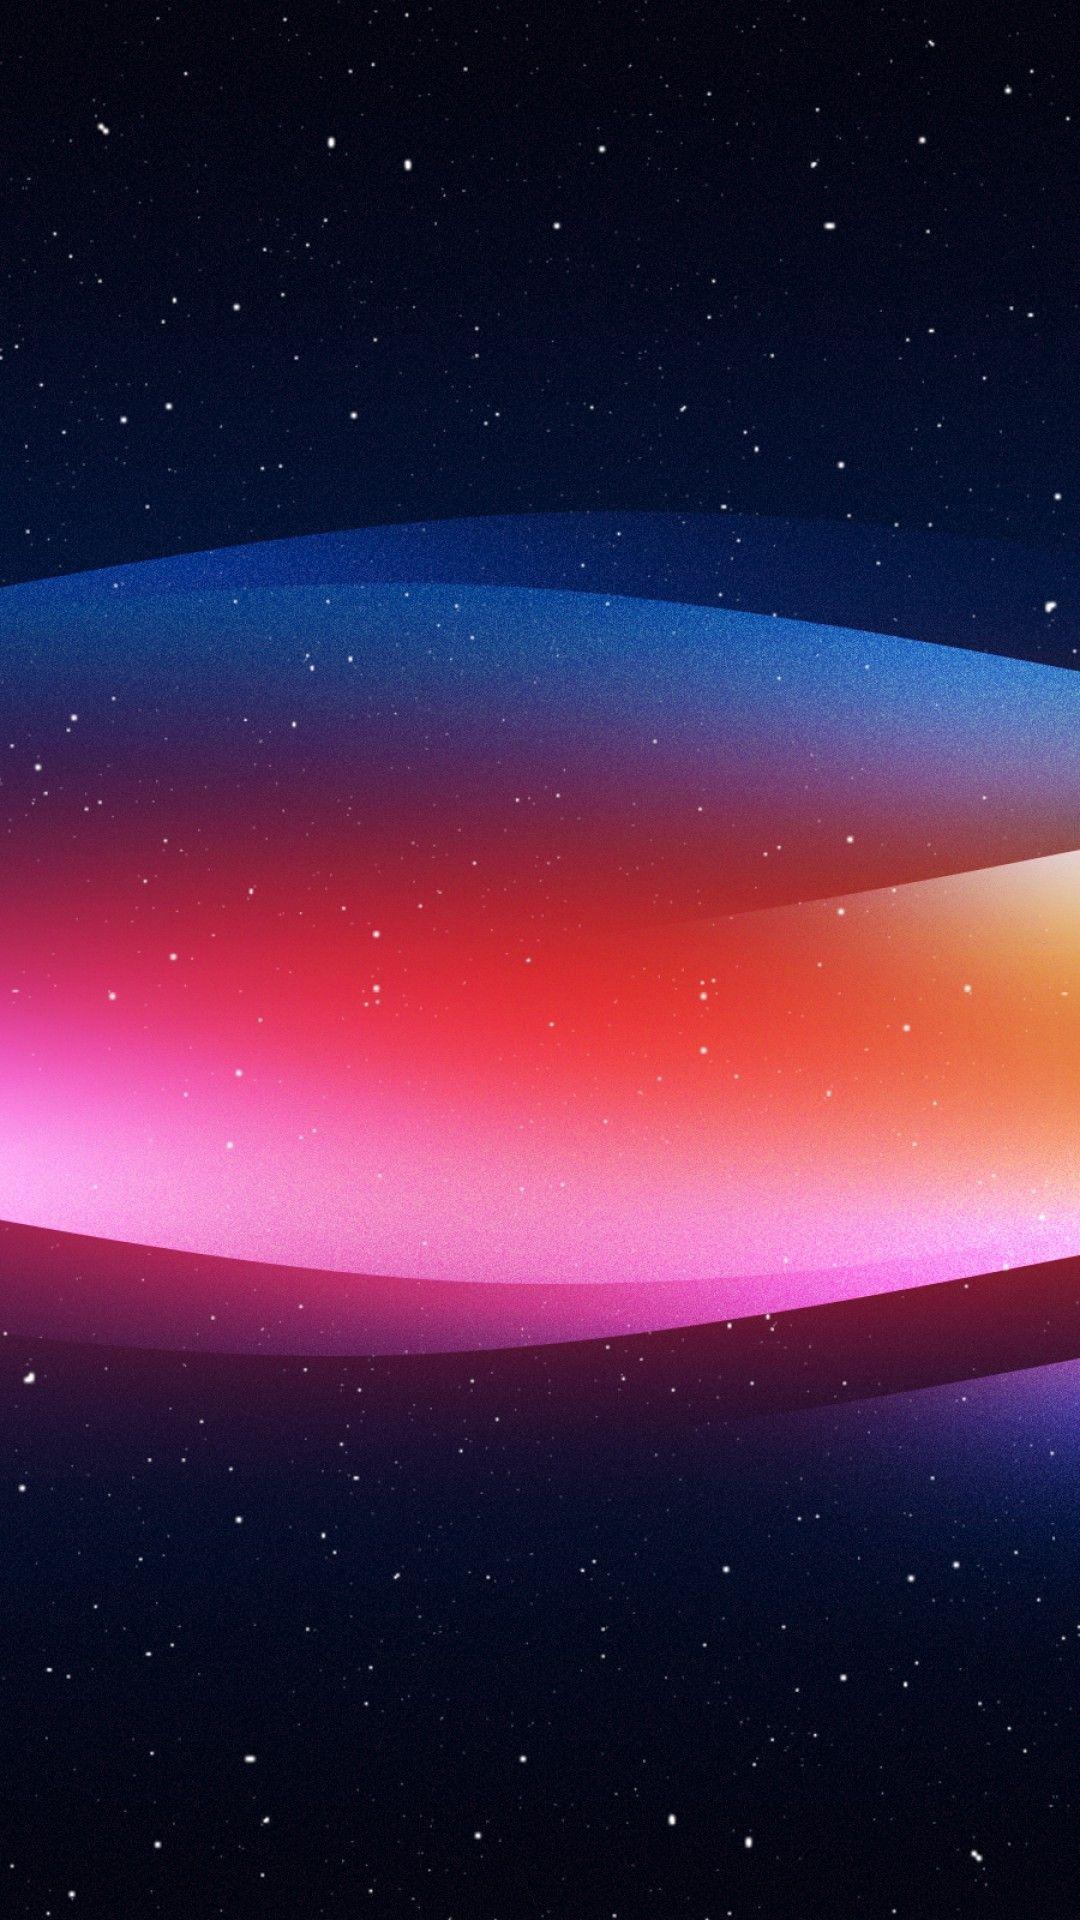 iPhone 6 HD Wallpaper